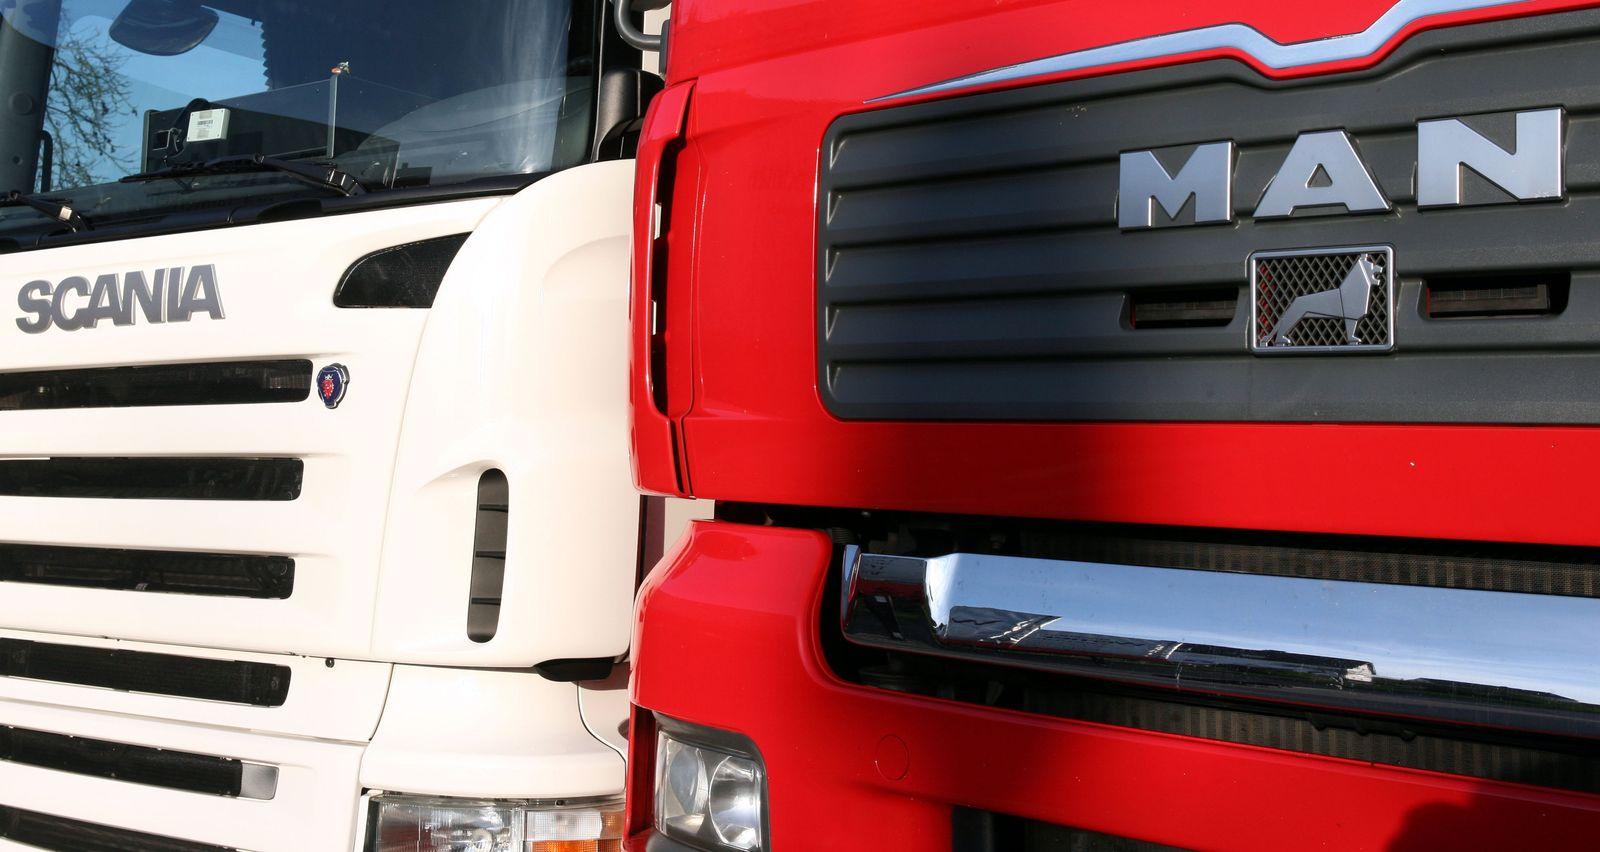 Scania / MAN / Lkw / Lkws / Trucks